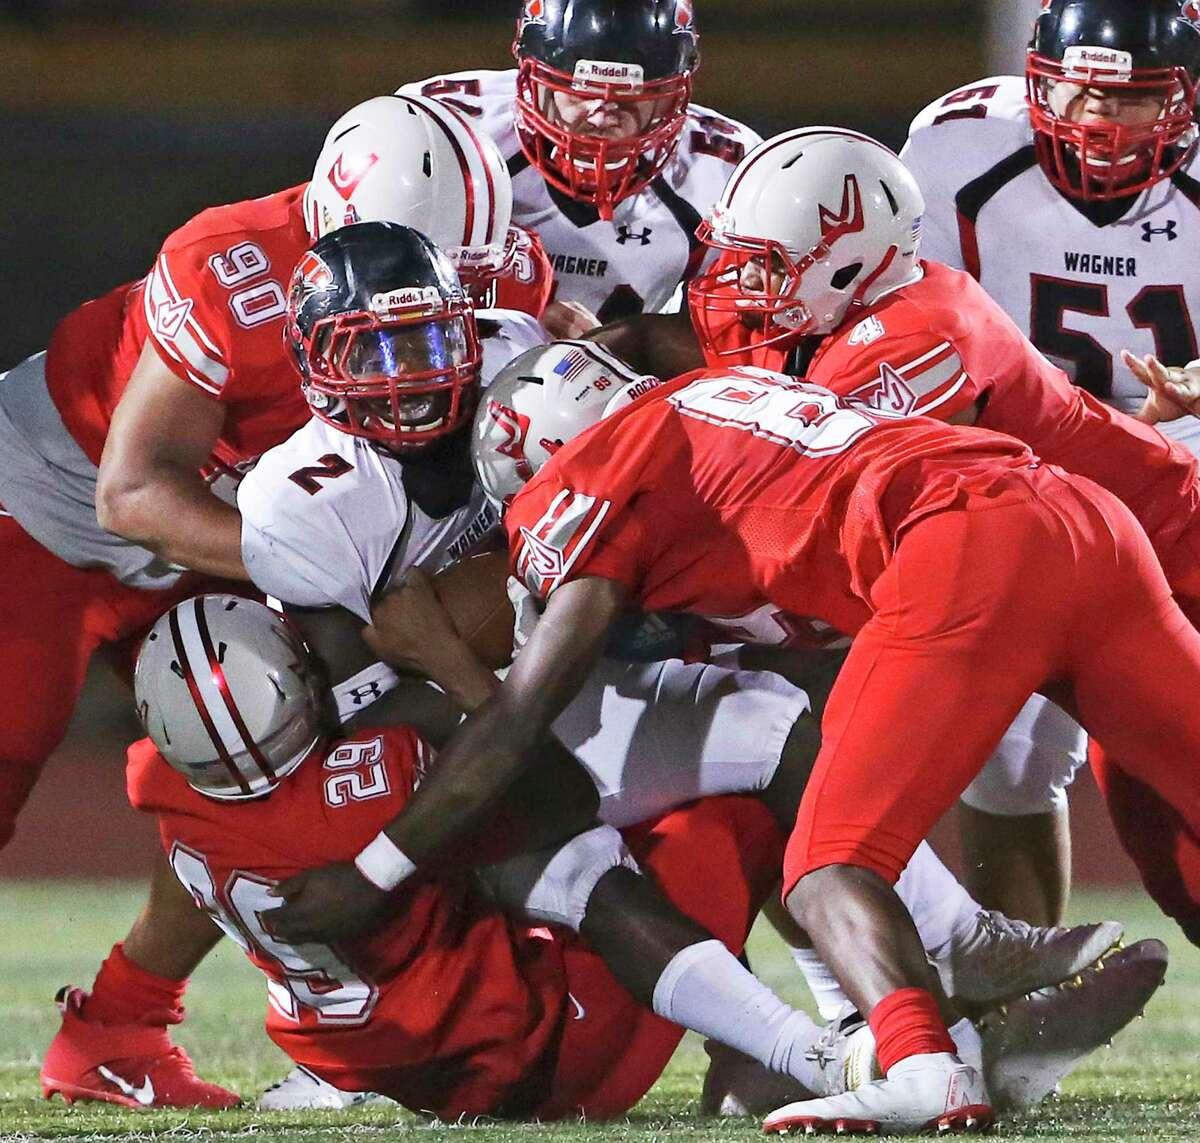 The Rocket defense halts L.J. Butler at the line as Judson plays Wagner at Rutledge Stadium on September 6, 2019.